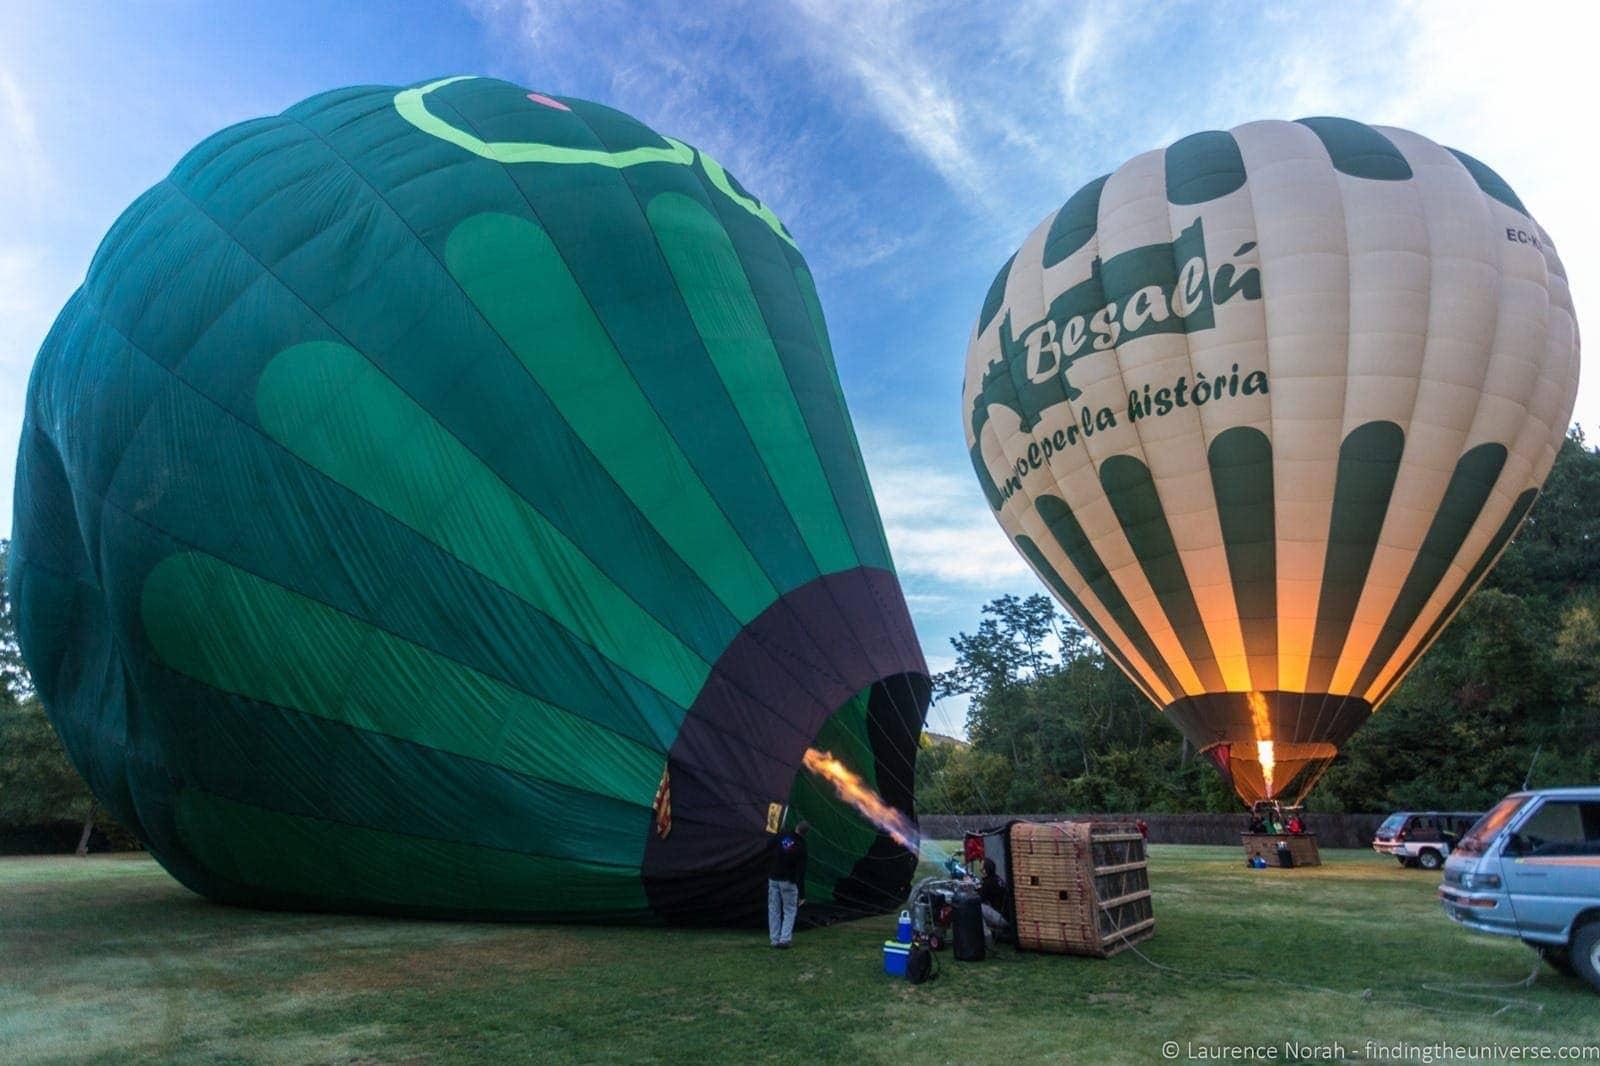 Balloon Vol de Coloms Costa Brava 2